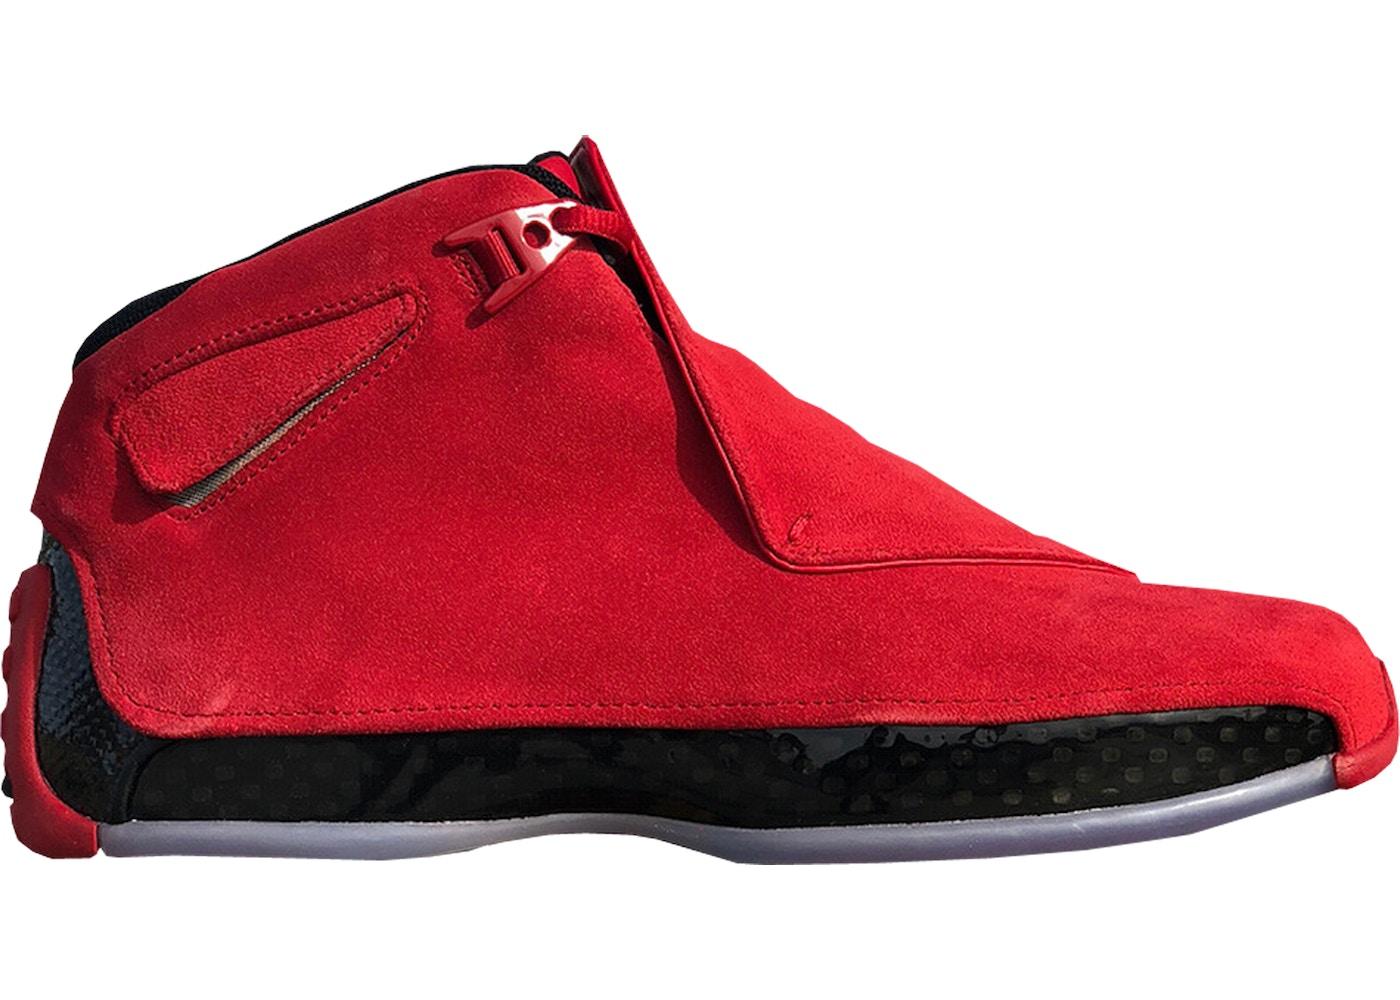 c434e23f838f ... 21 Retro XXI Red Suede – Dark Sole  Jordan 18 Retro Toro - AA2494-601  ...